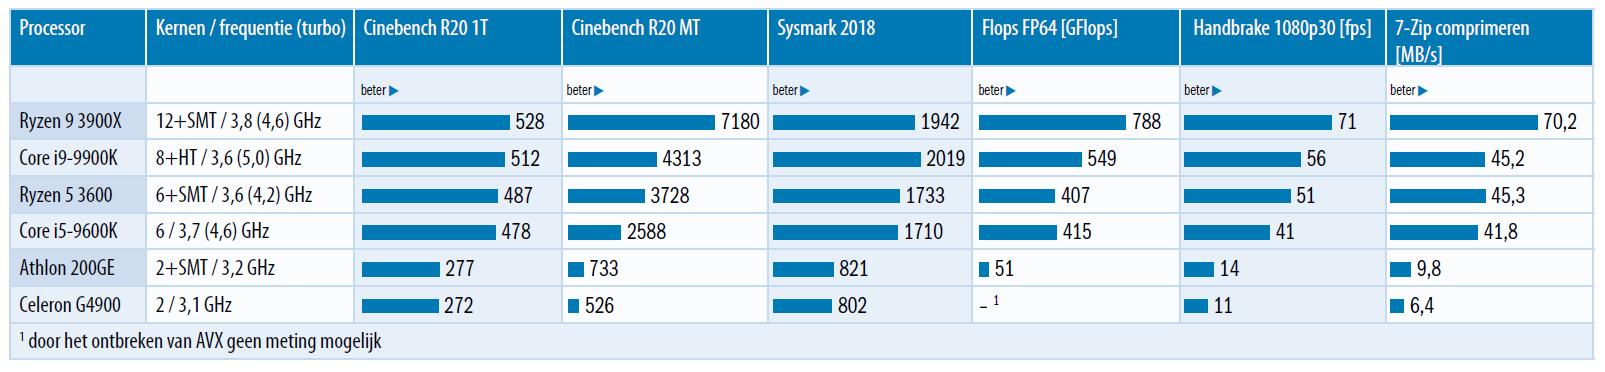 benchmark resultaten processor desktop pc